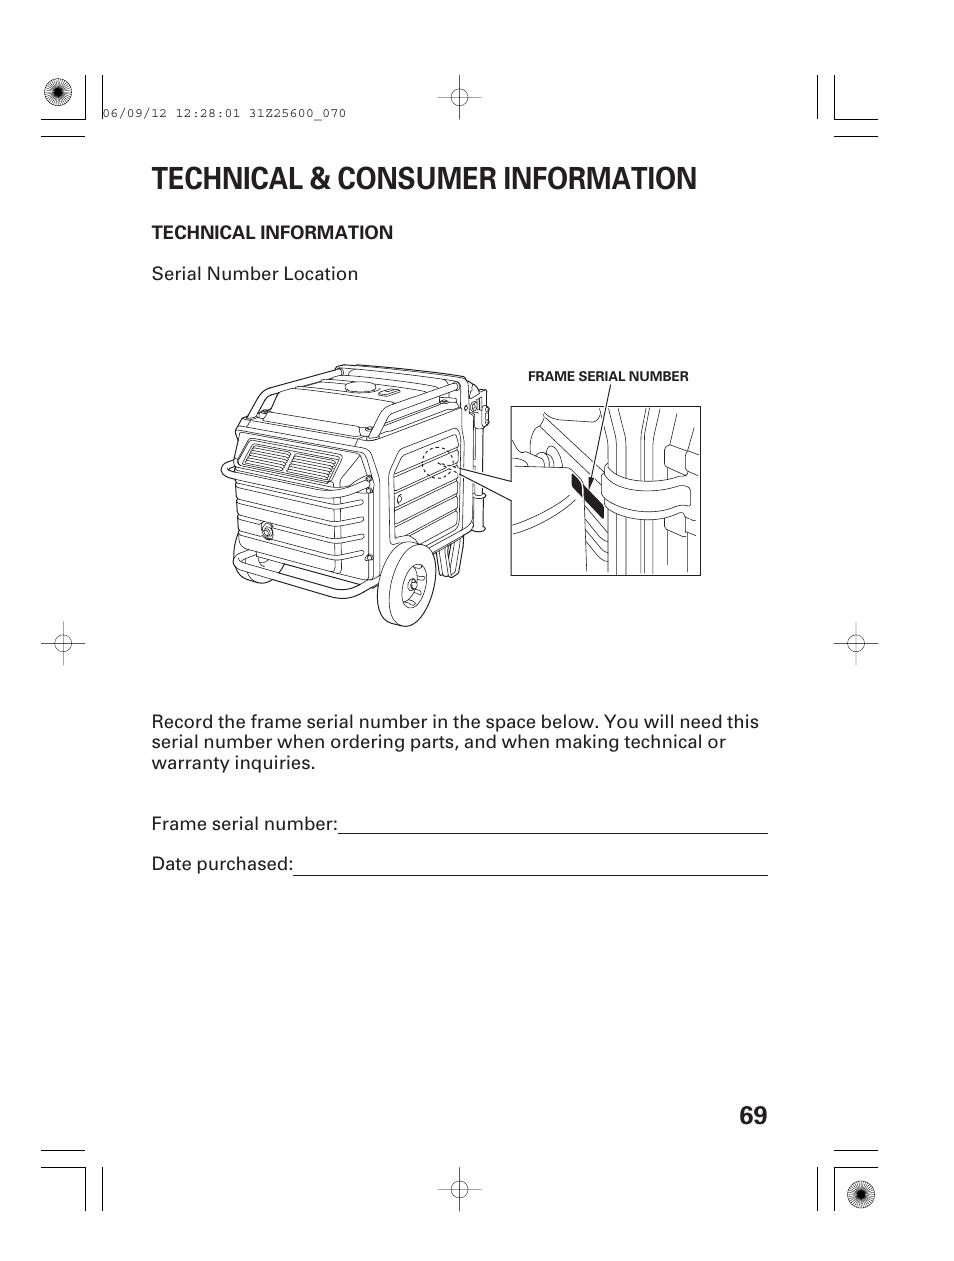 Honda Eu6500is Parts Diagram Electrical Wiring Diagrams Of All Years An Generator Carburetor Technical Consumer Information Serial Em5000sx